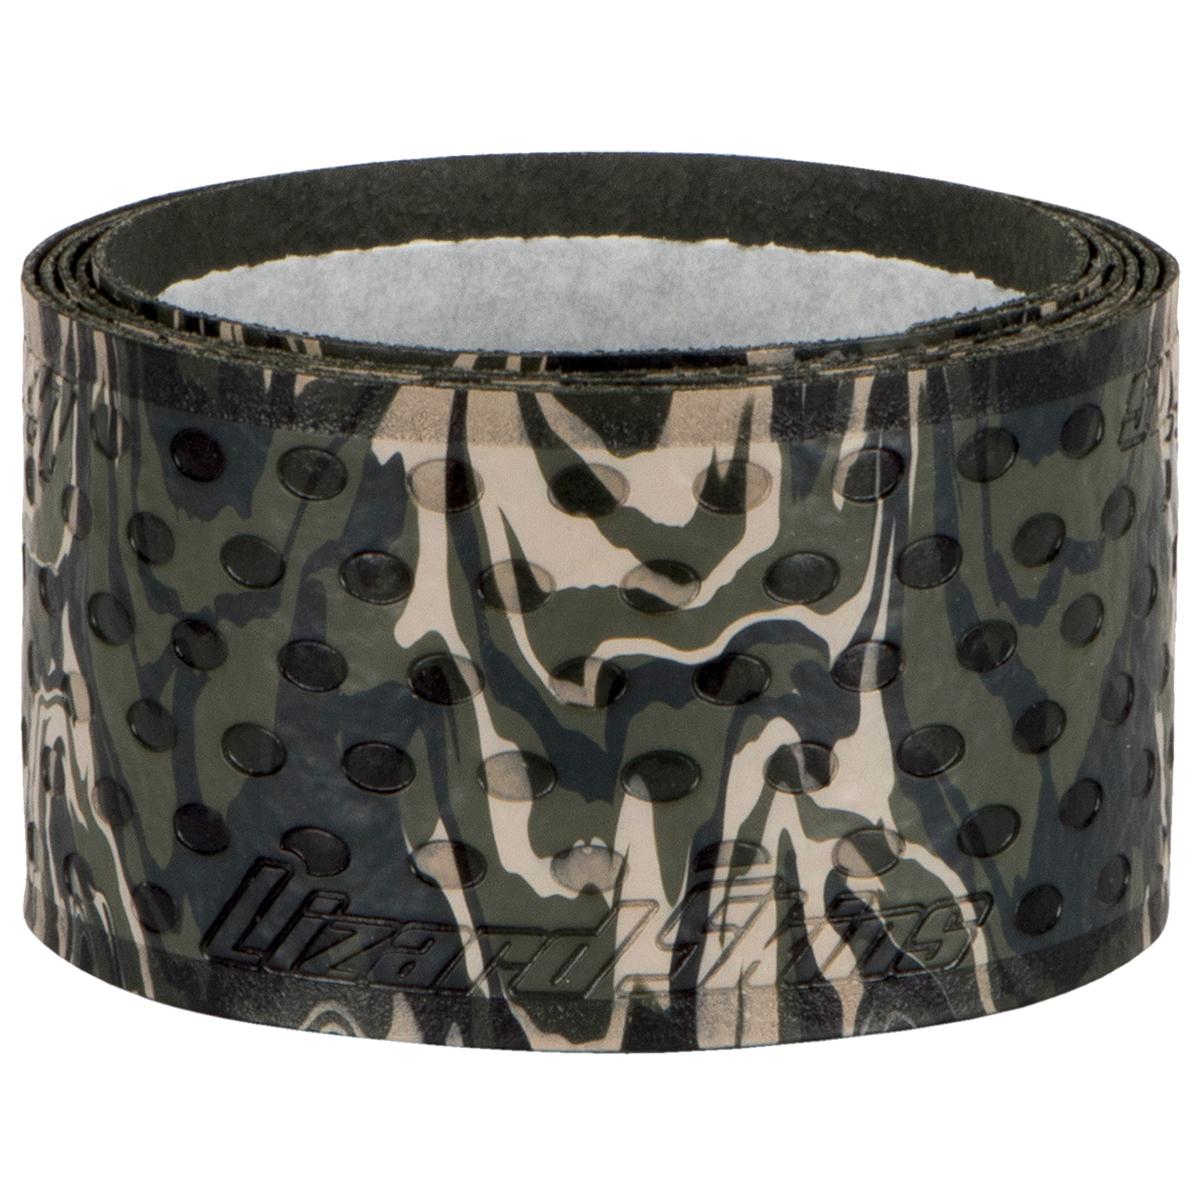 Lizard-Skins-Lightweight-Slip-Resistant-Durasoft-Polymer-Bat-Grip-Wrap